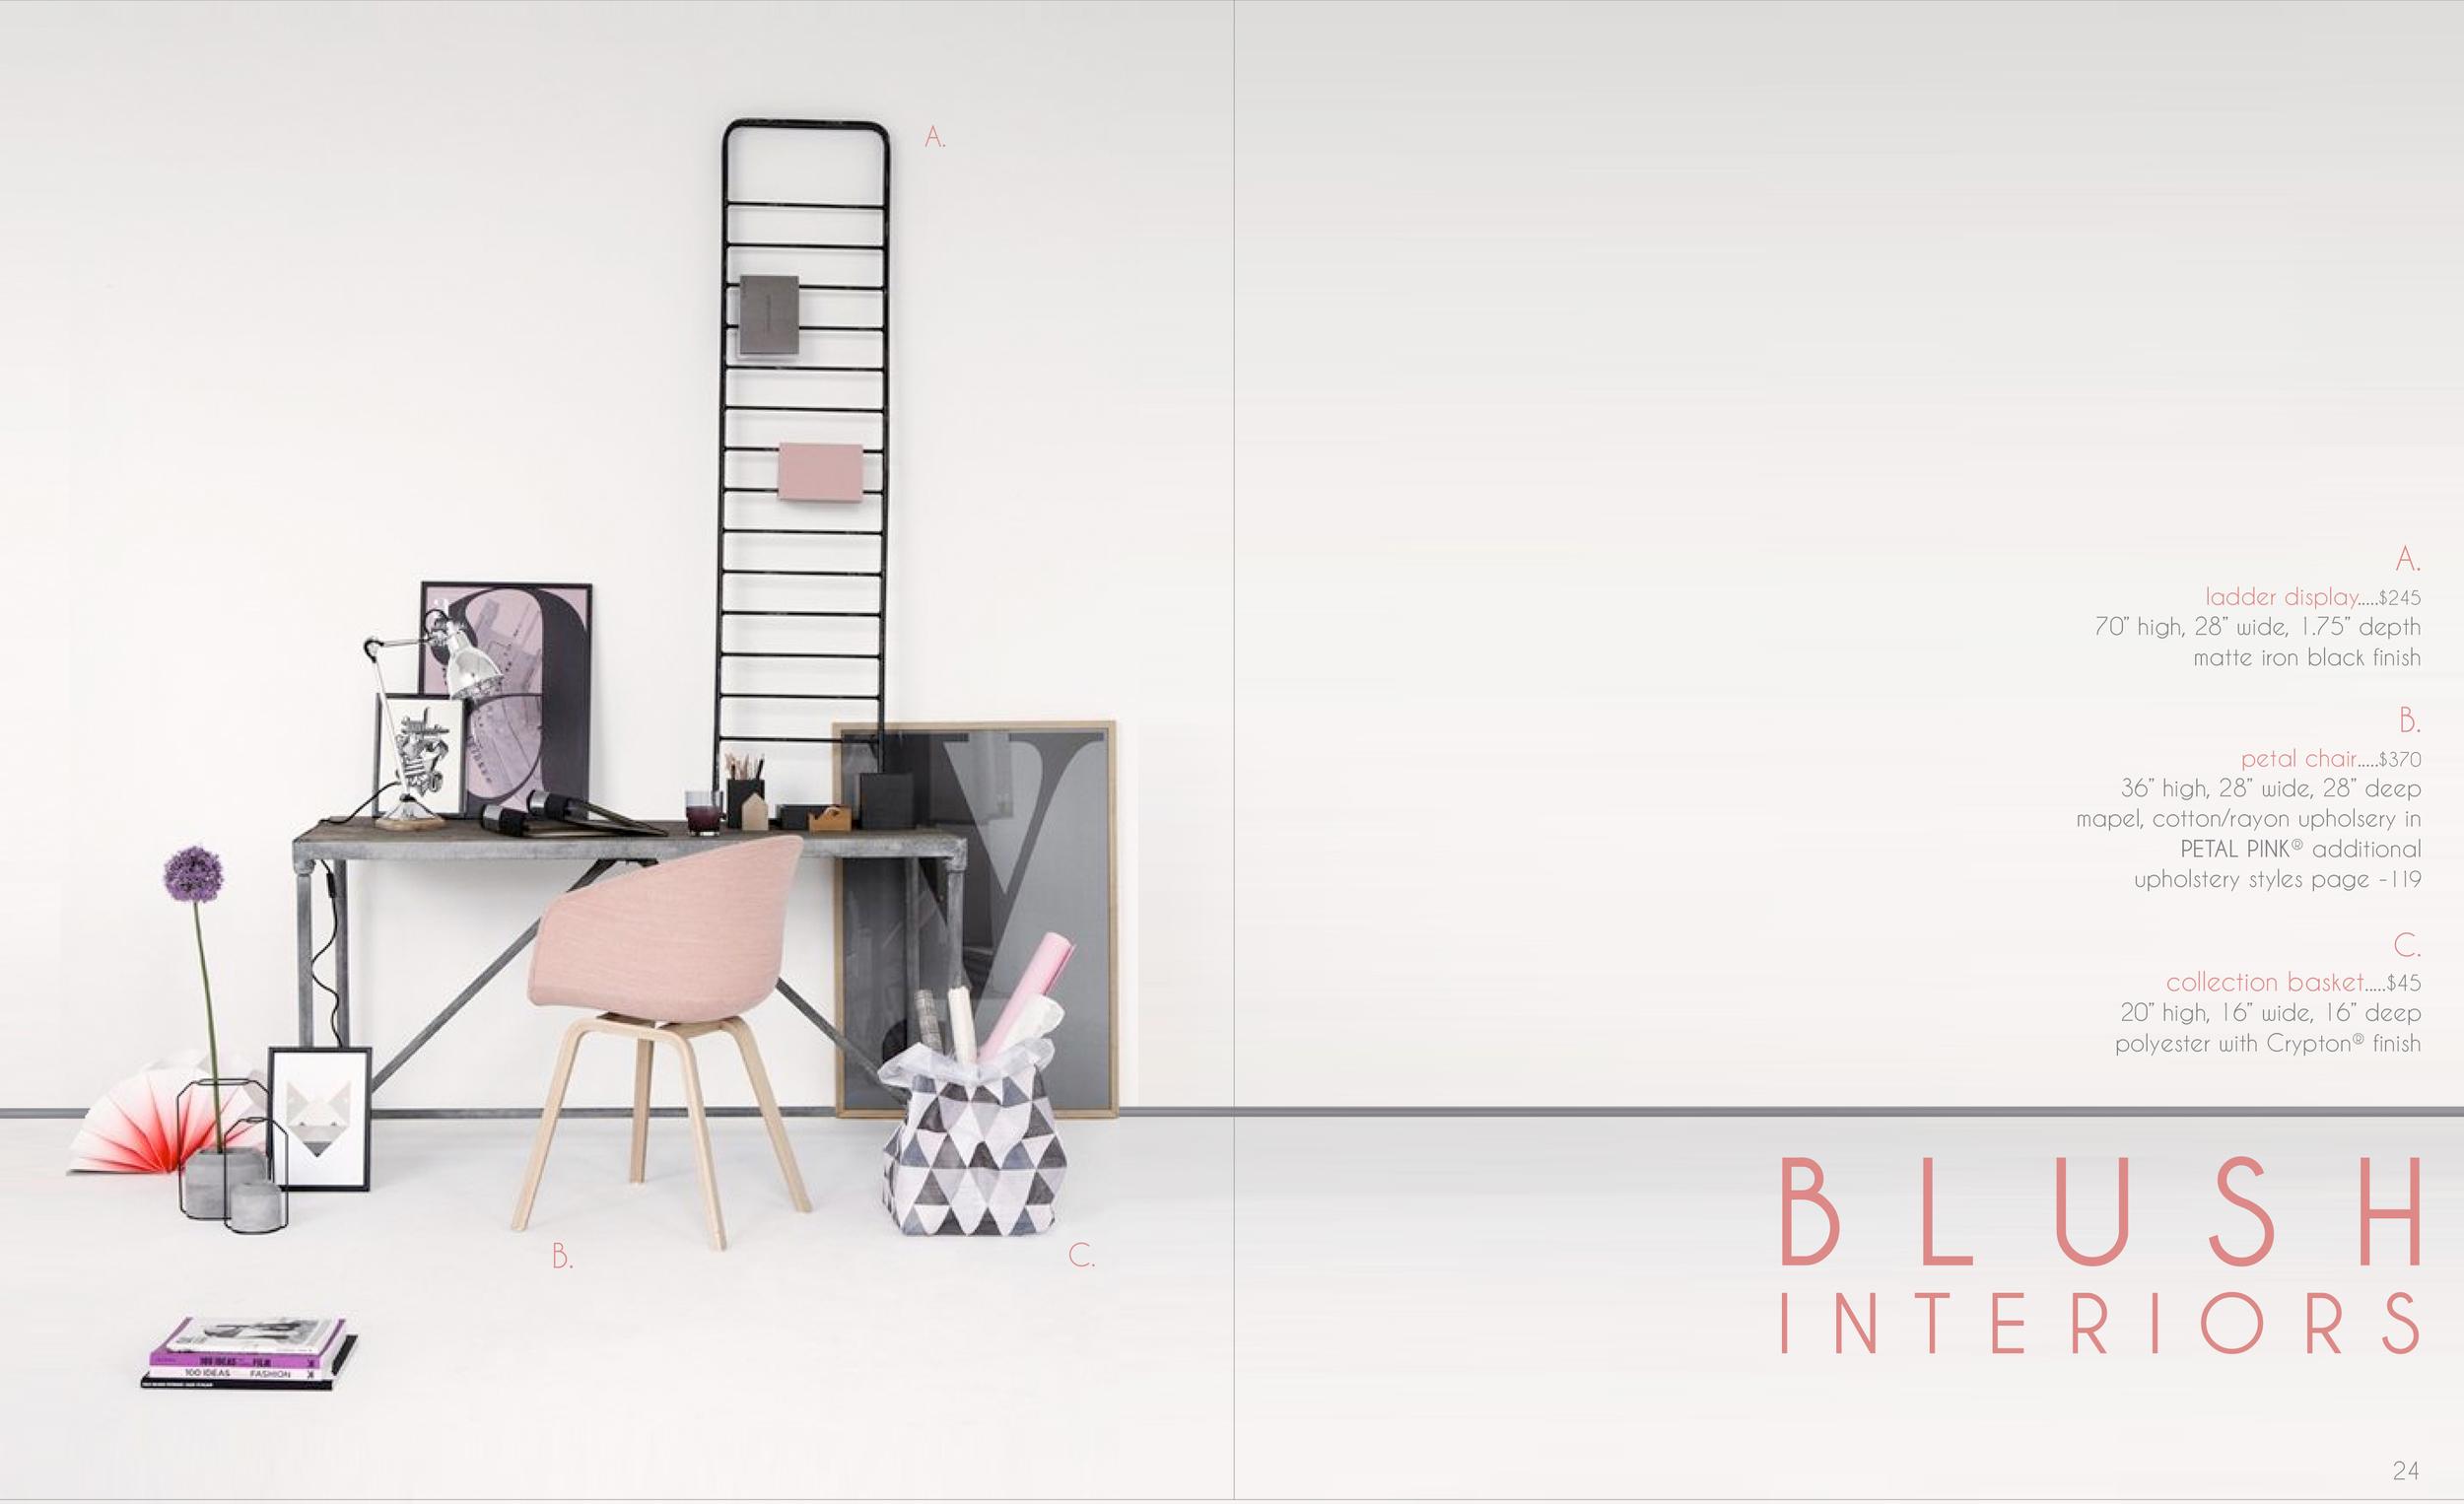 blush interior layout.jpg